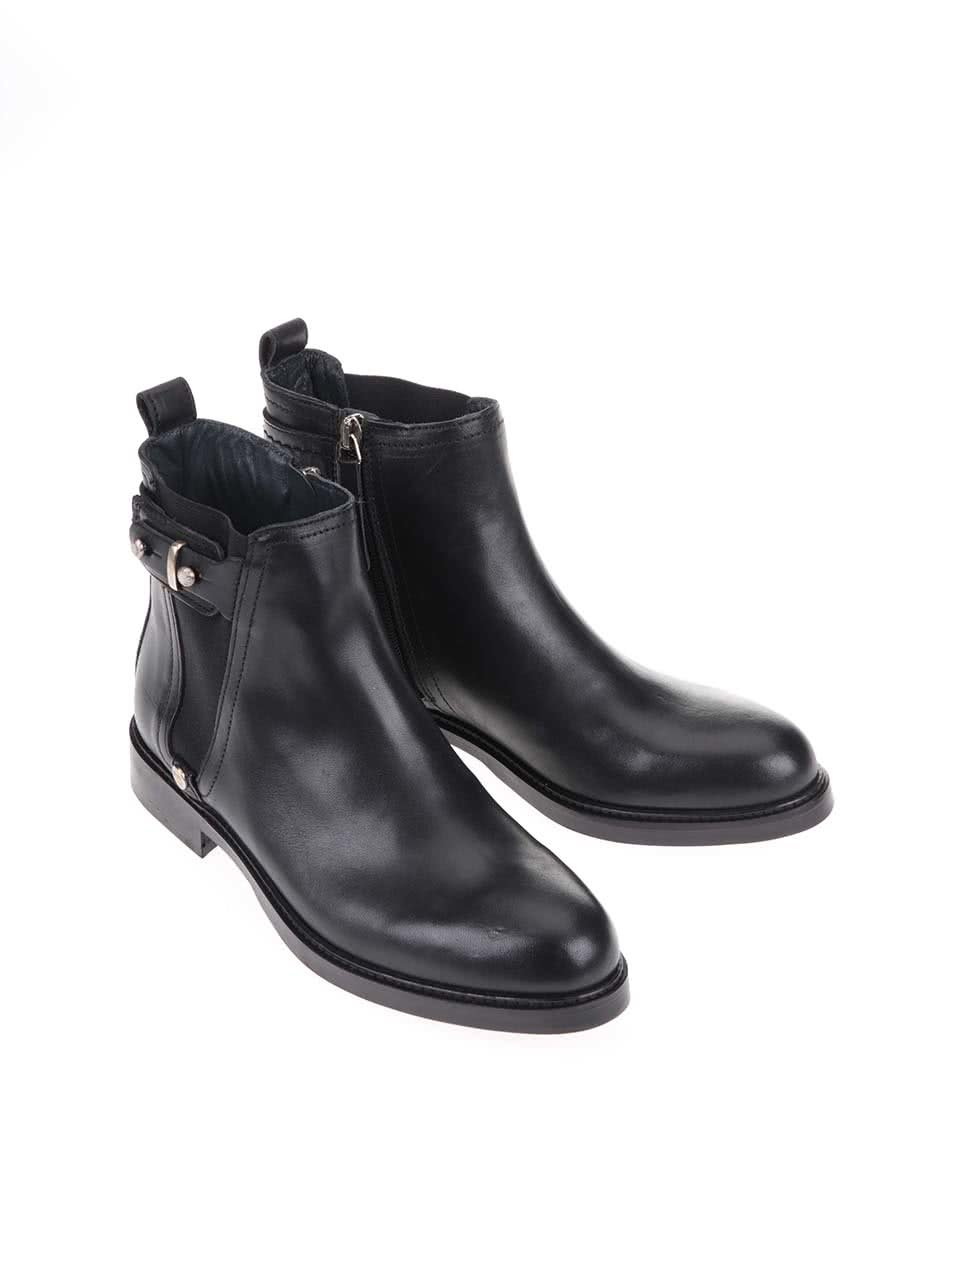 db4e87ce30 Čierne dámske kožené členkové topánky Tommy Hilfiger Holly ...